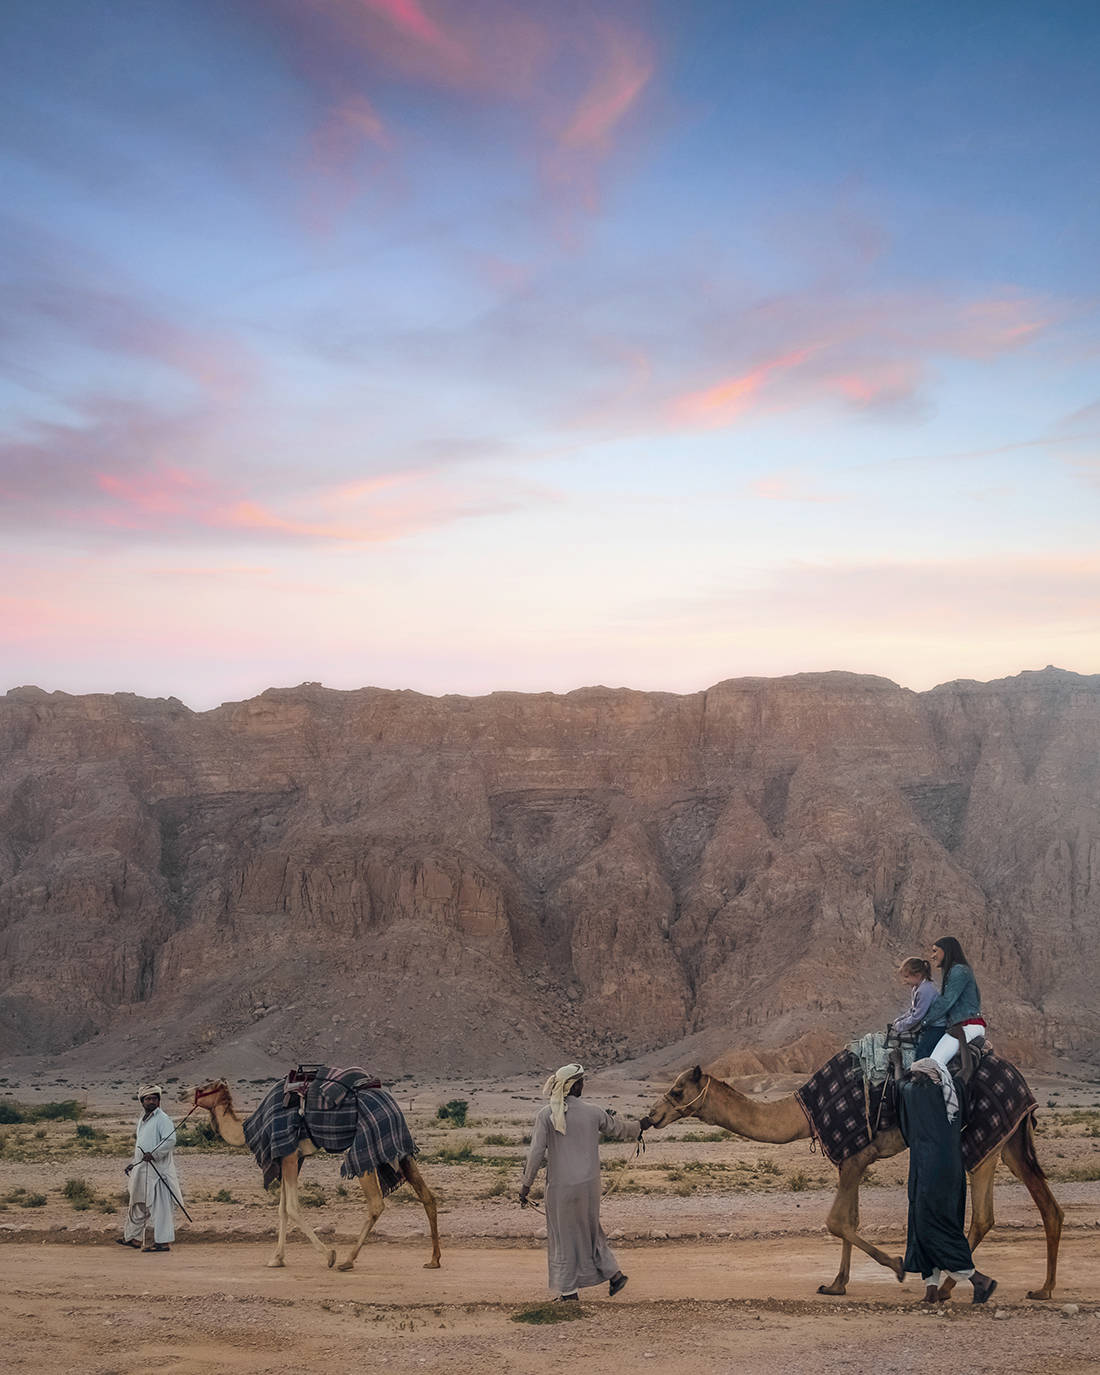 Jebel Hafit and Jebel Hafit Desert Park